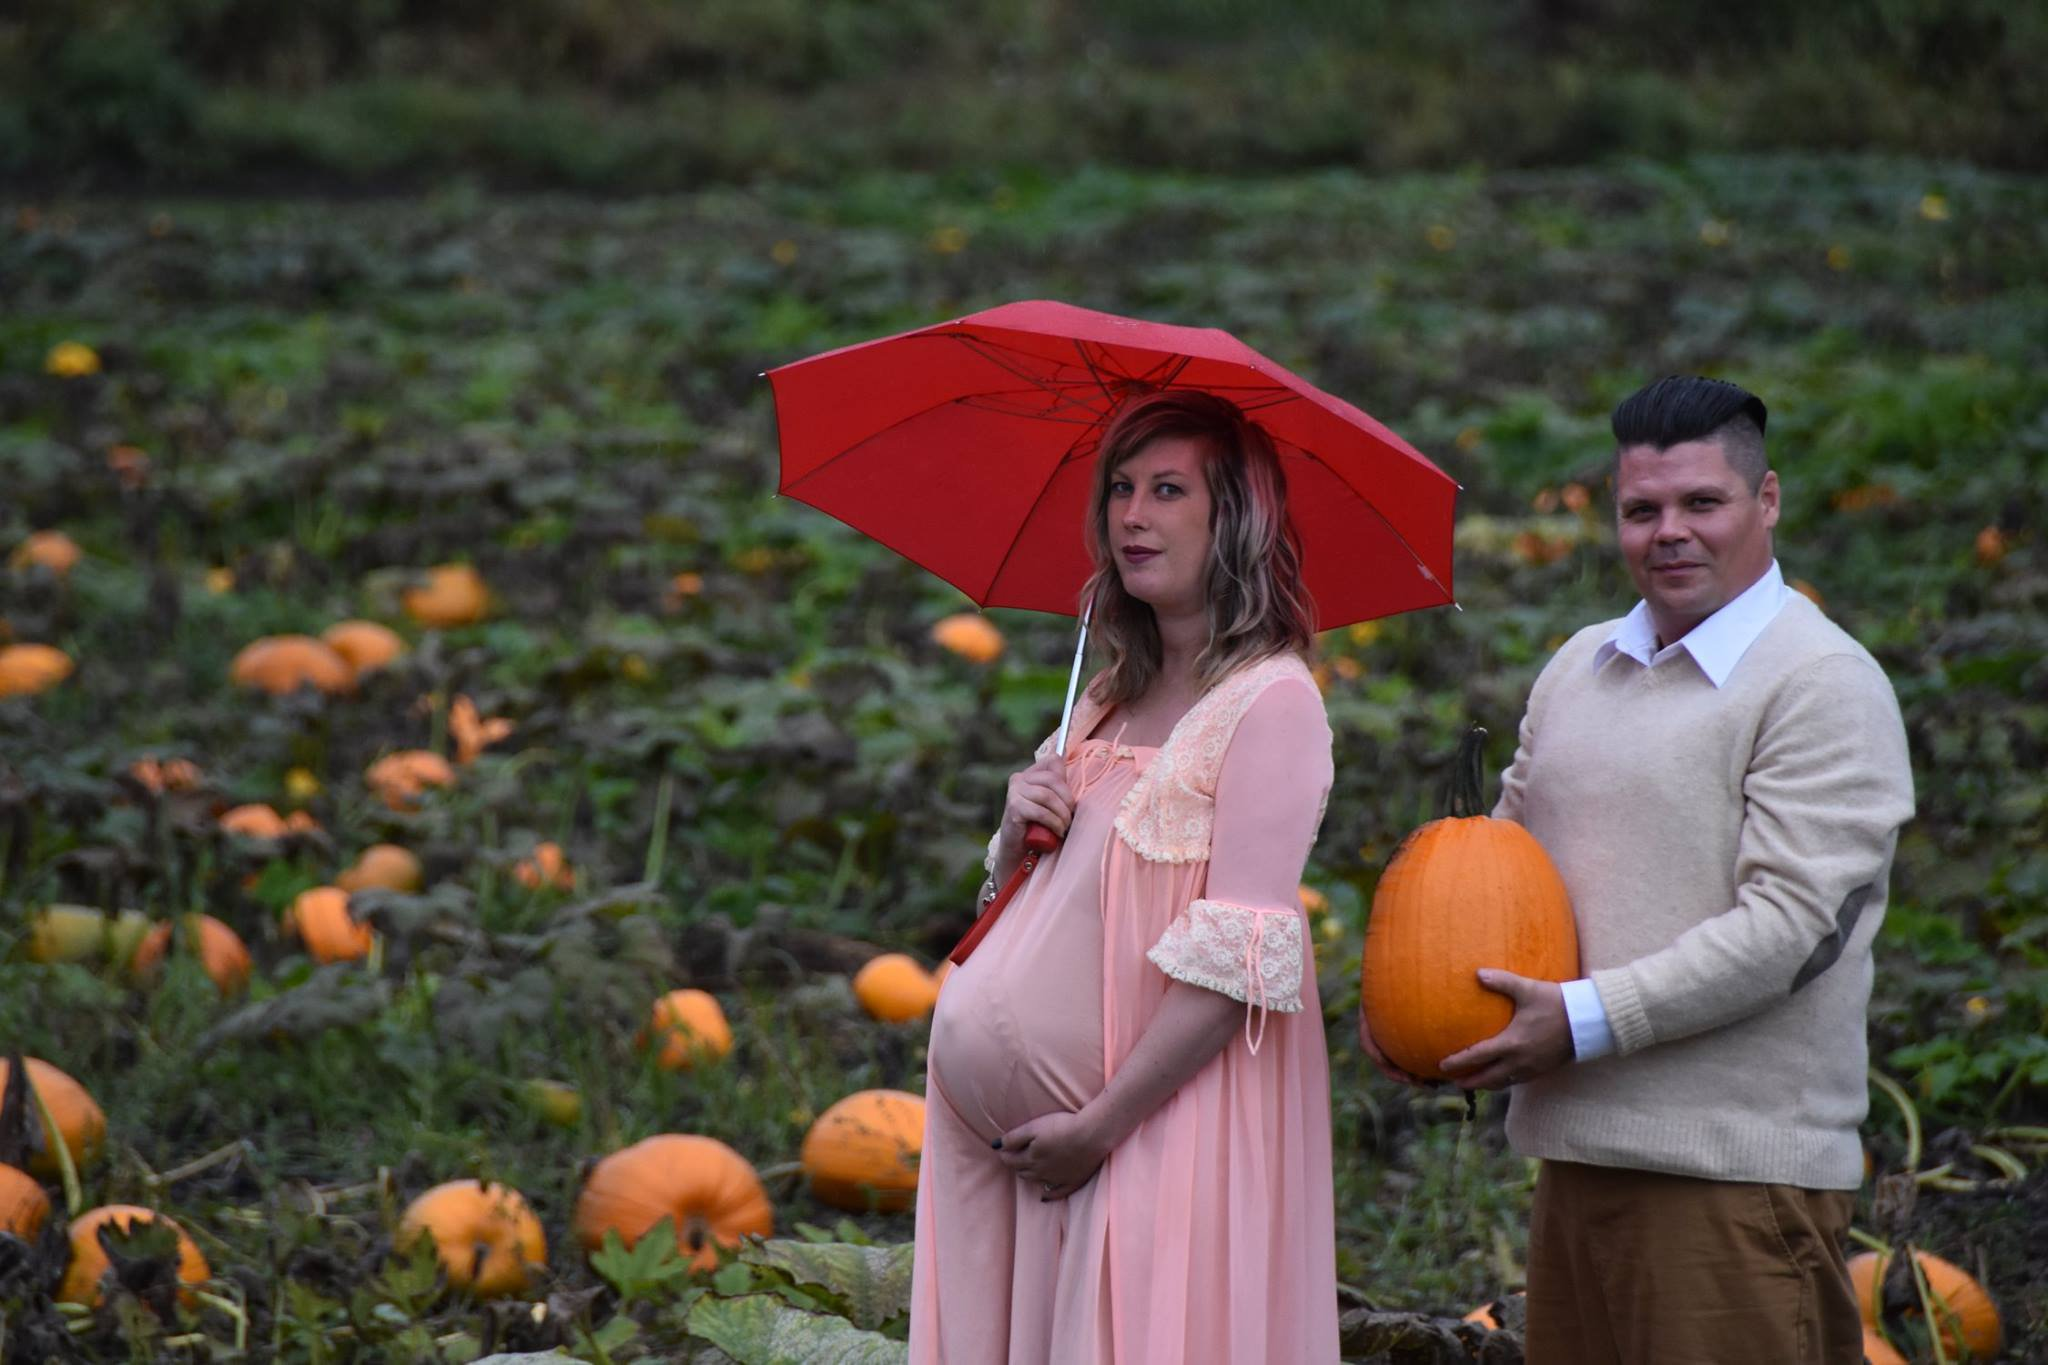 Pic 2. Todd Cameron - Alien maternity shoot in British Columbia (Picture: Li Carter)